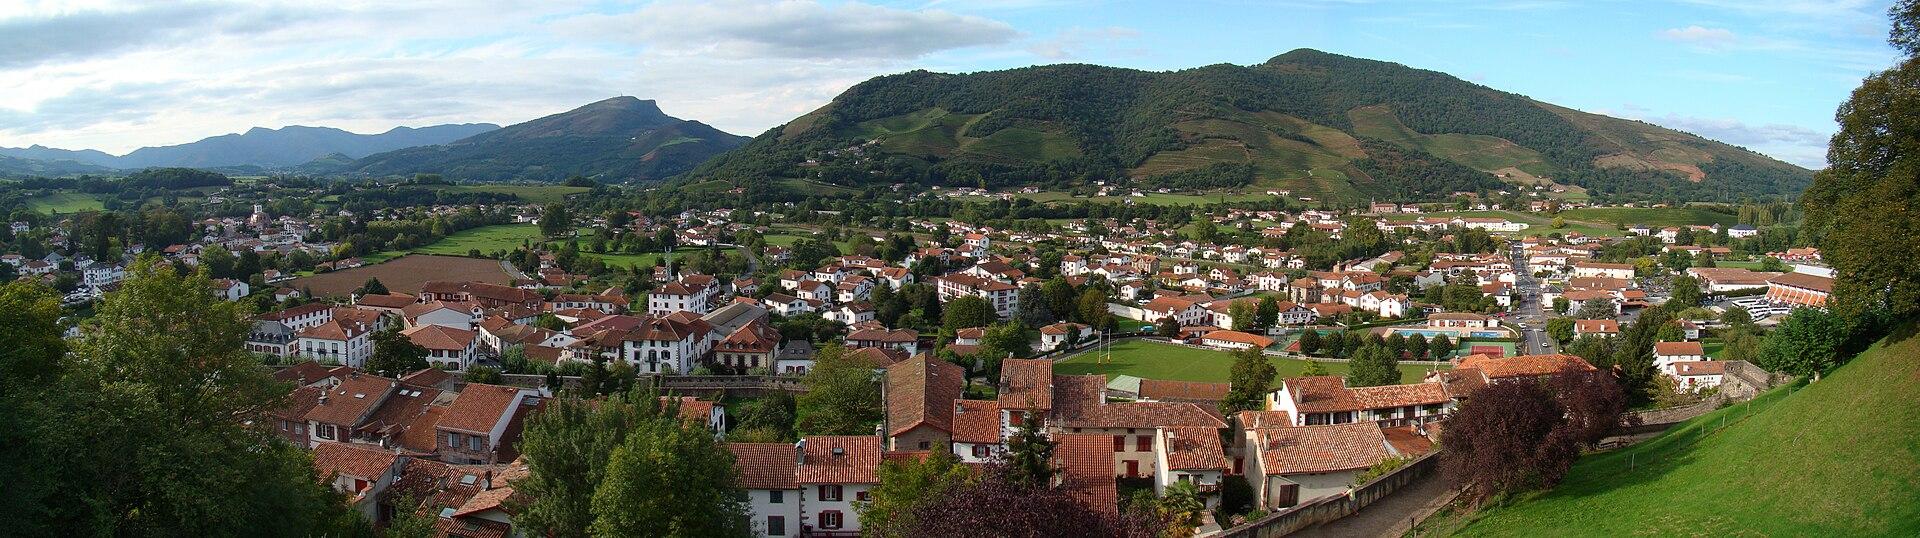 St-Jean-Panorama-2010.jpg